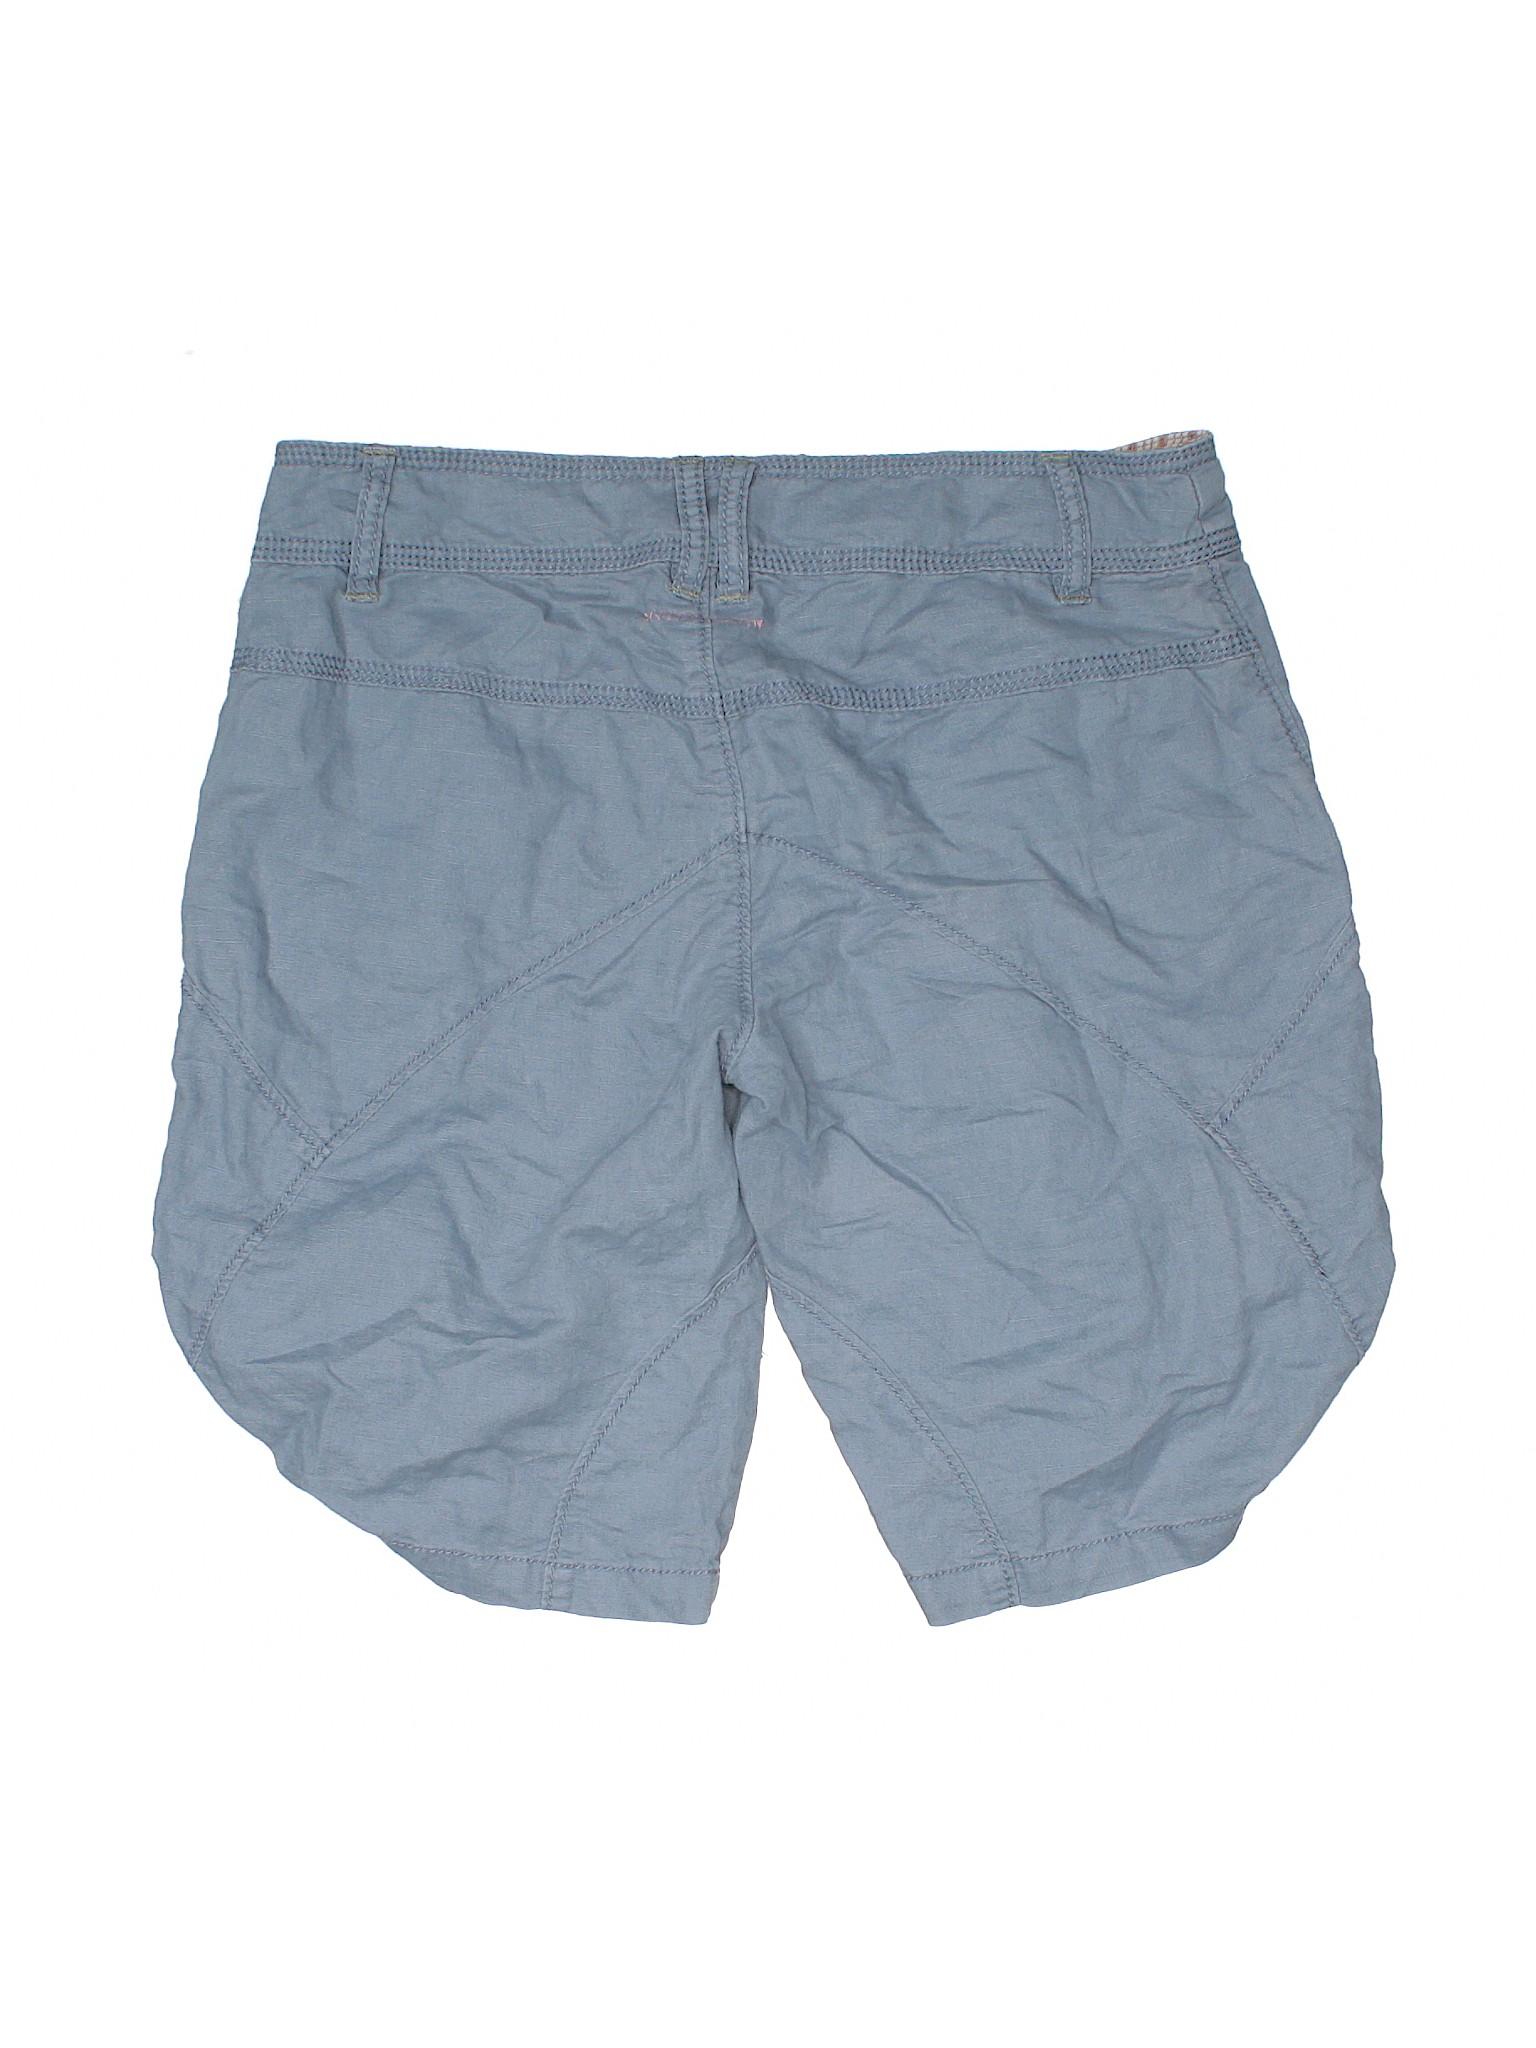 People Leisure Shorts Free winter Khaki qCvwExRCz